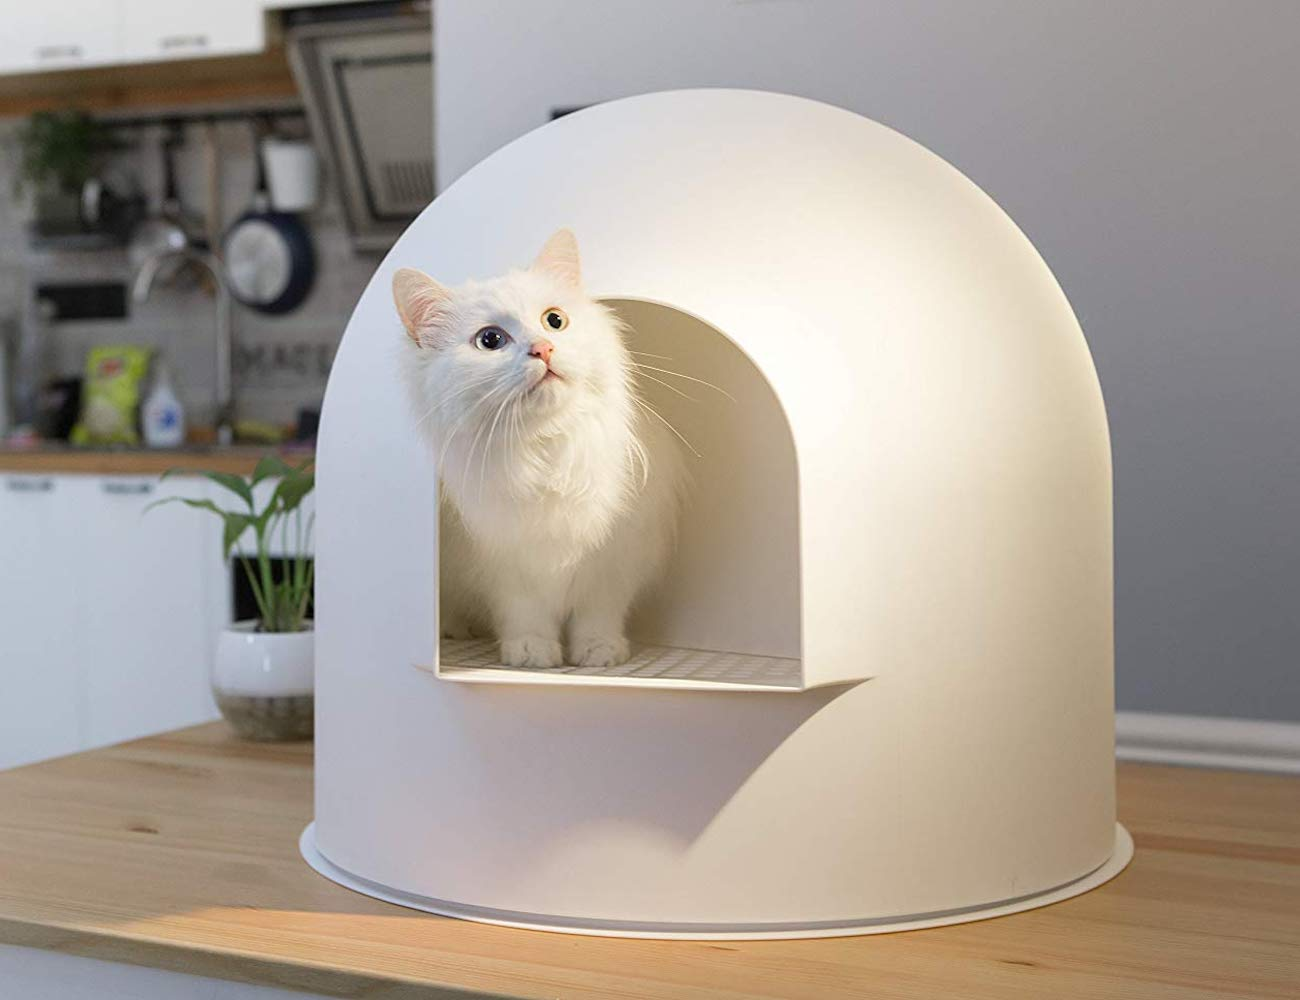 Pidan Snow House Igloo Cat Litter Box